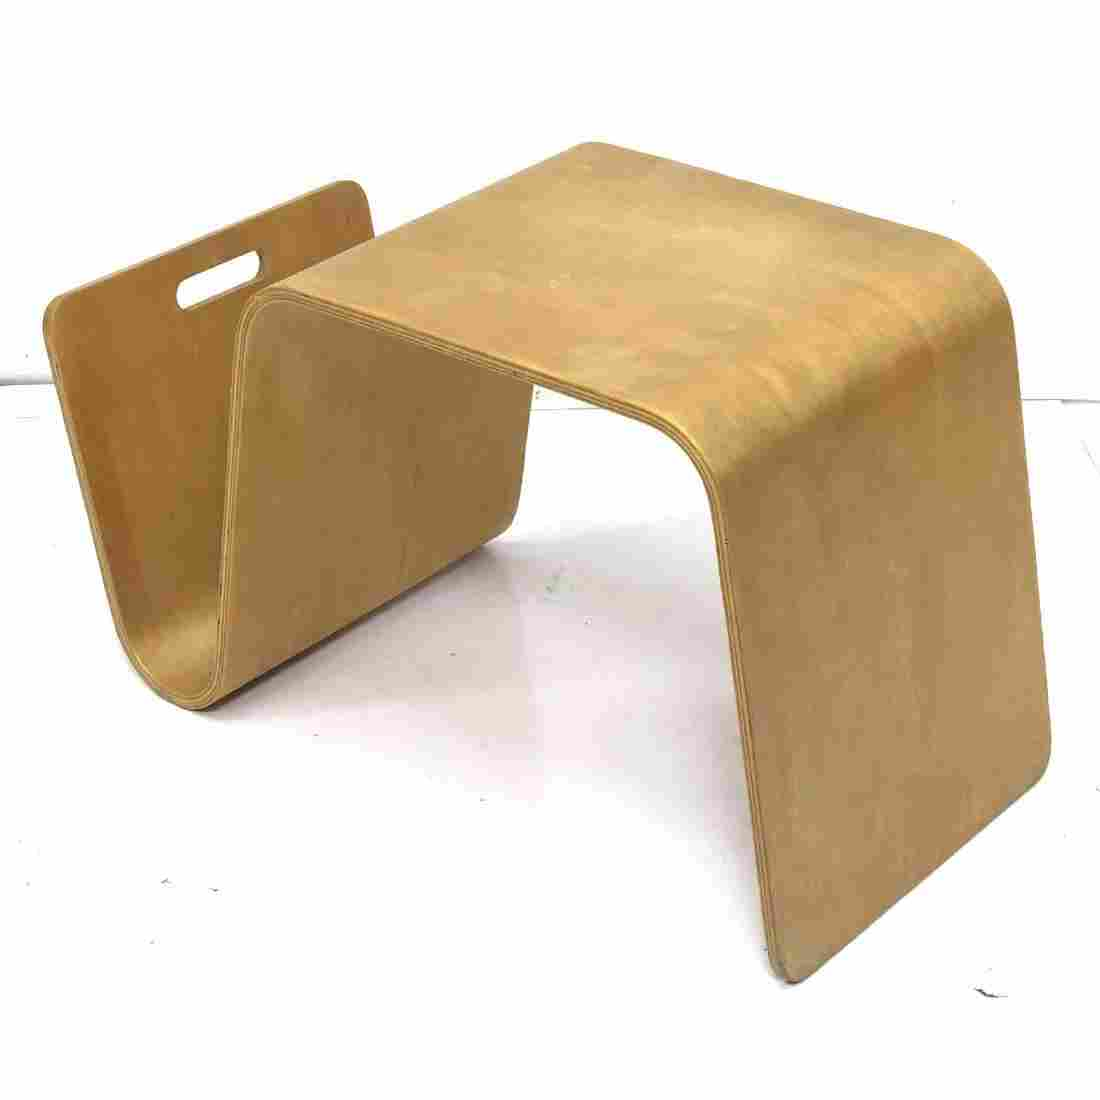 Alvar Aalto style Laminated Wood Bench Seat Magaz